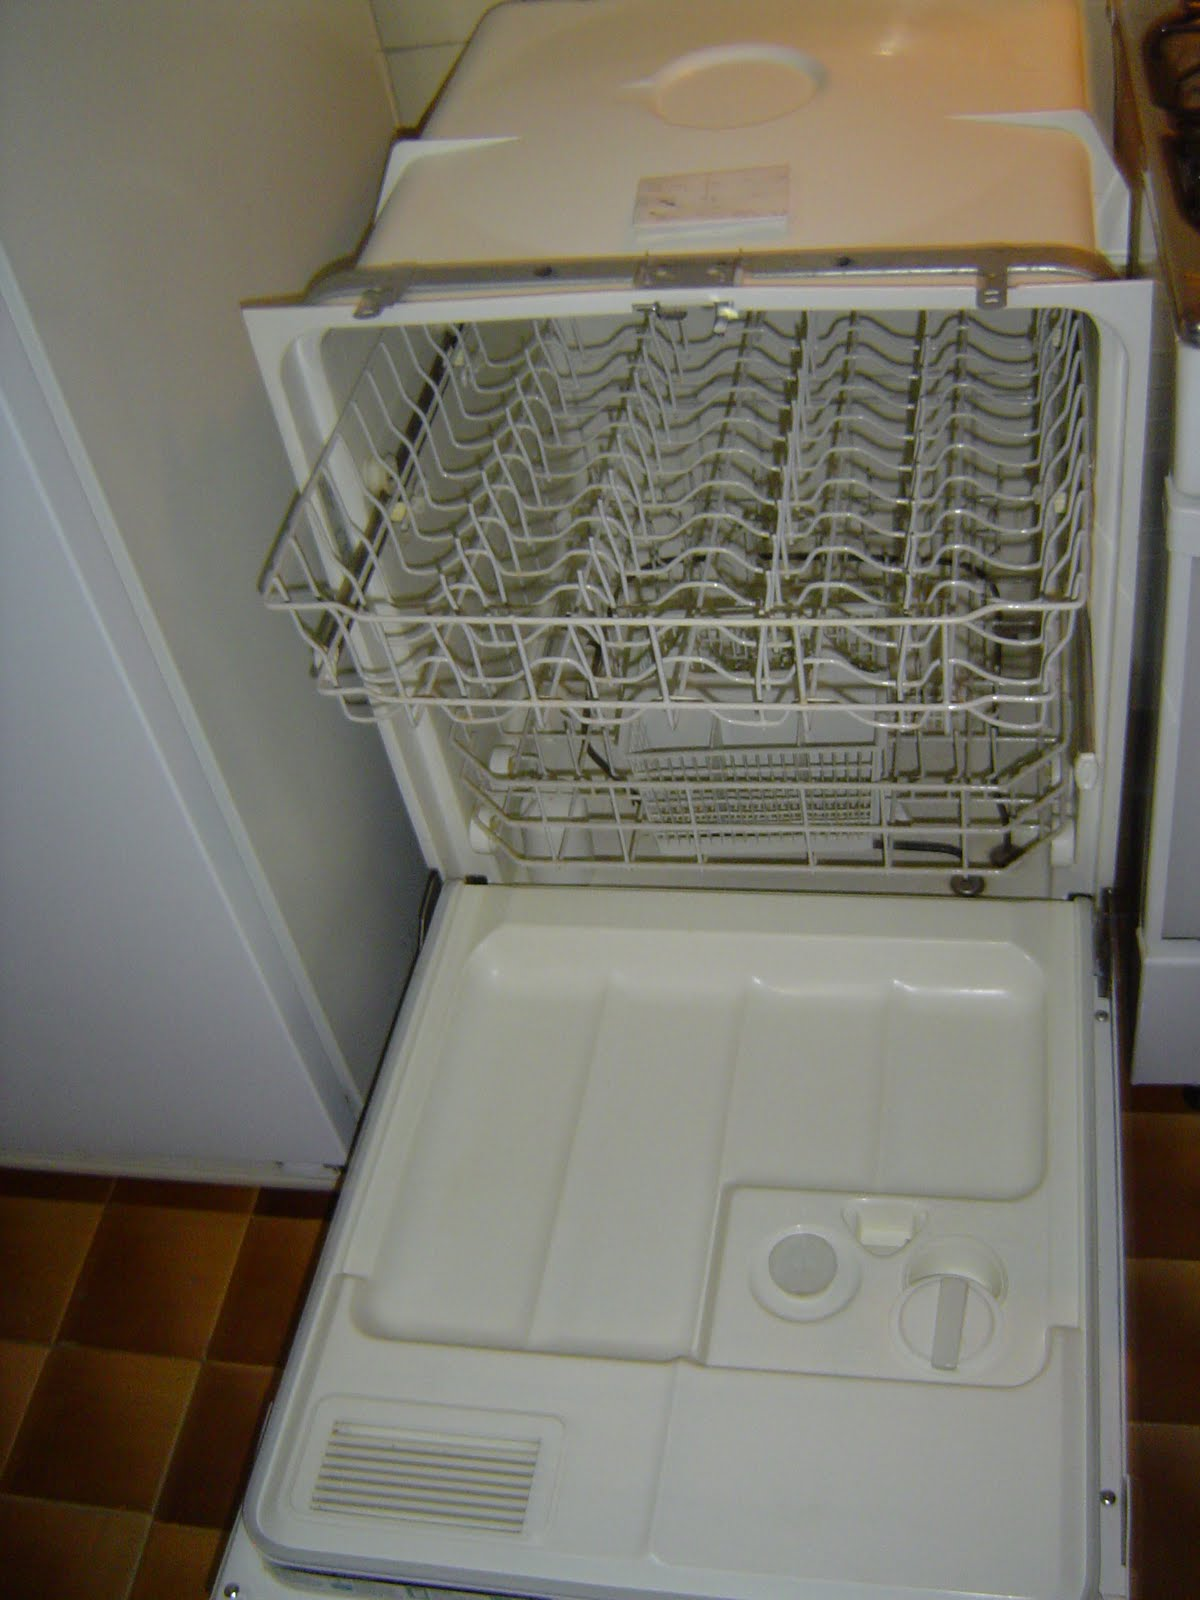 Para vender garage sale virtual maquina de lavar loucas ge r 250 00 - Vender garaje ...